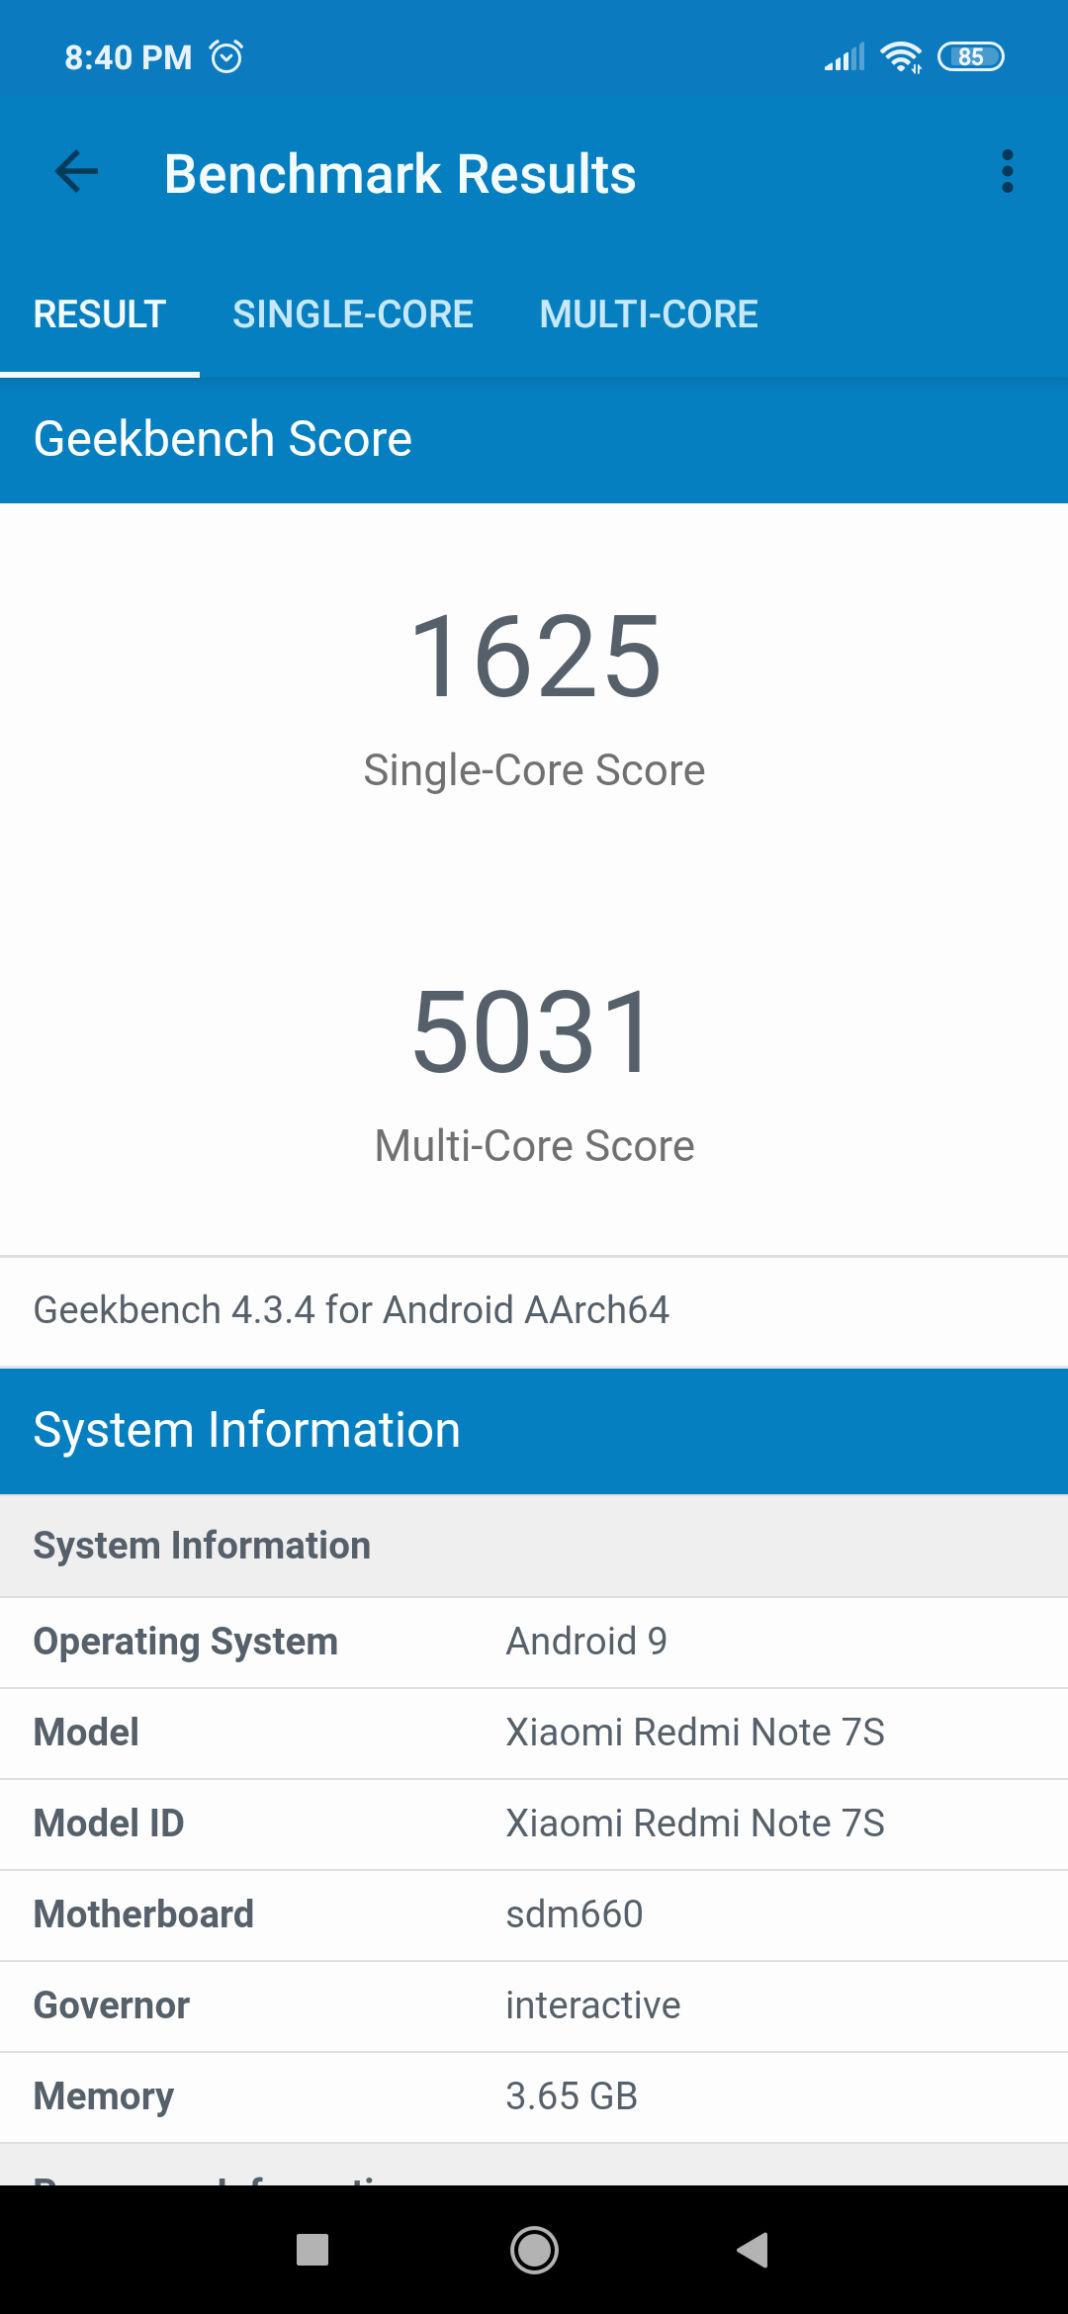 Xiaomi Redmi Note 7S Benchmark Geekbench 4